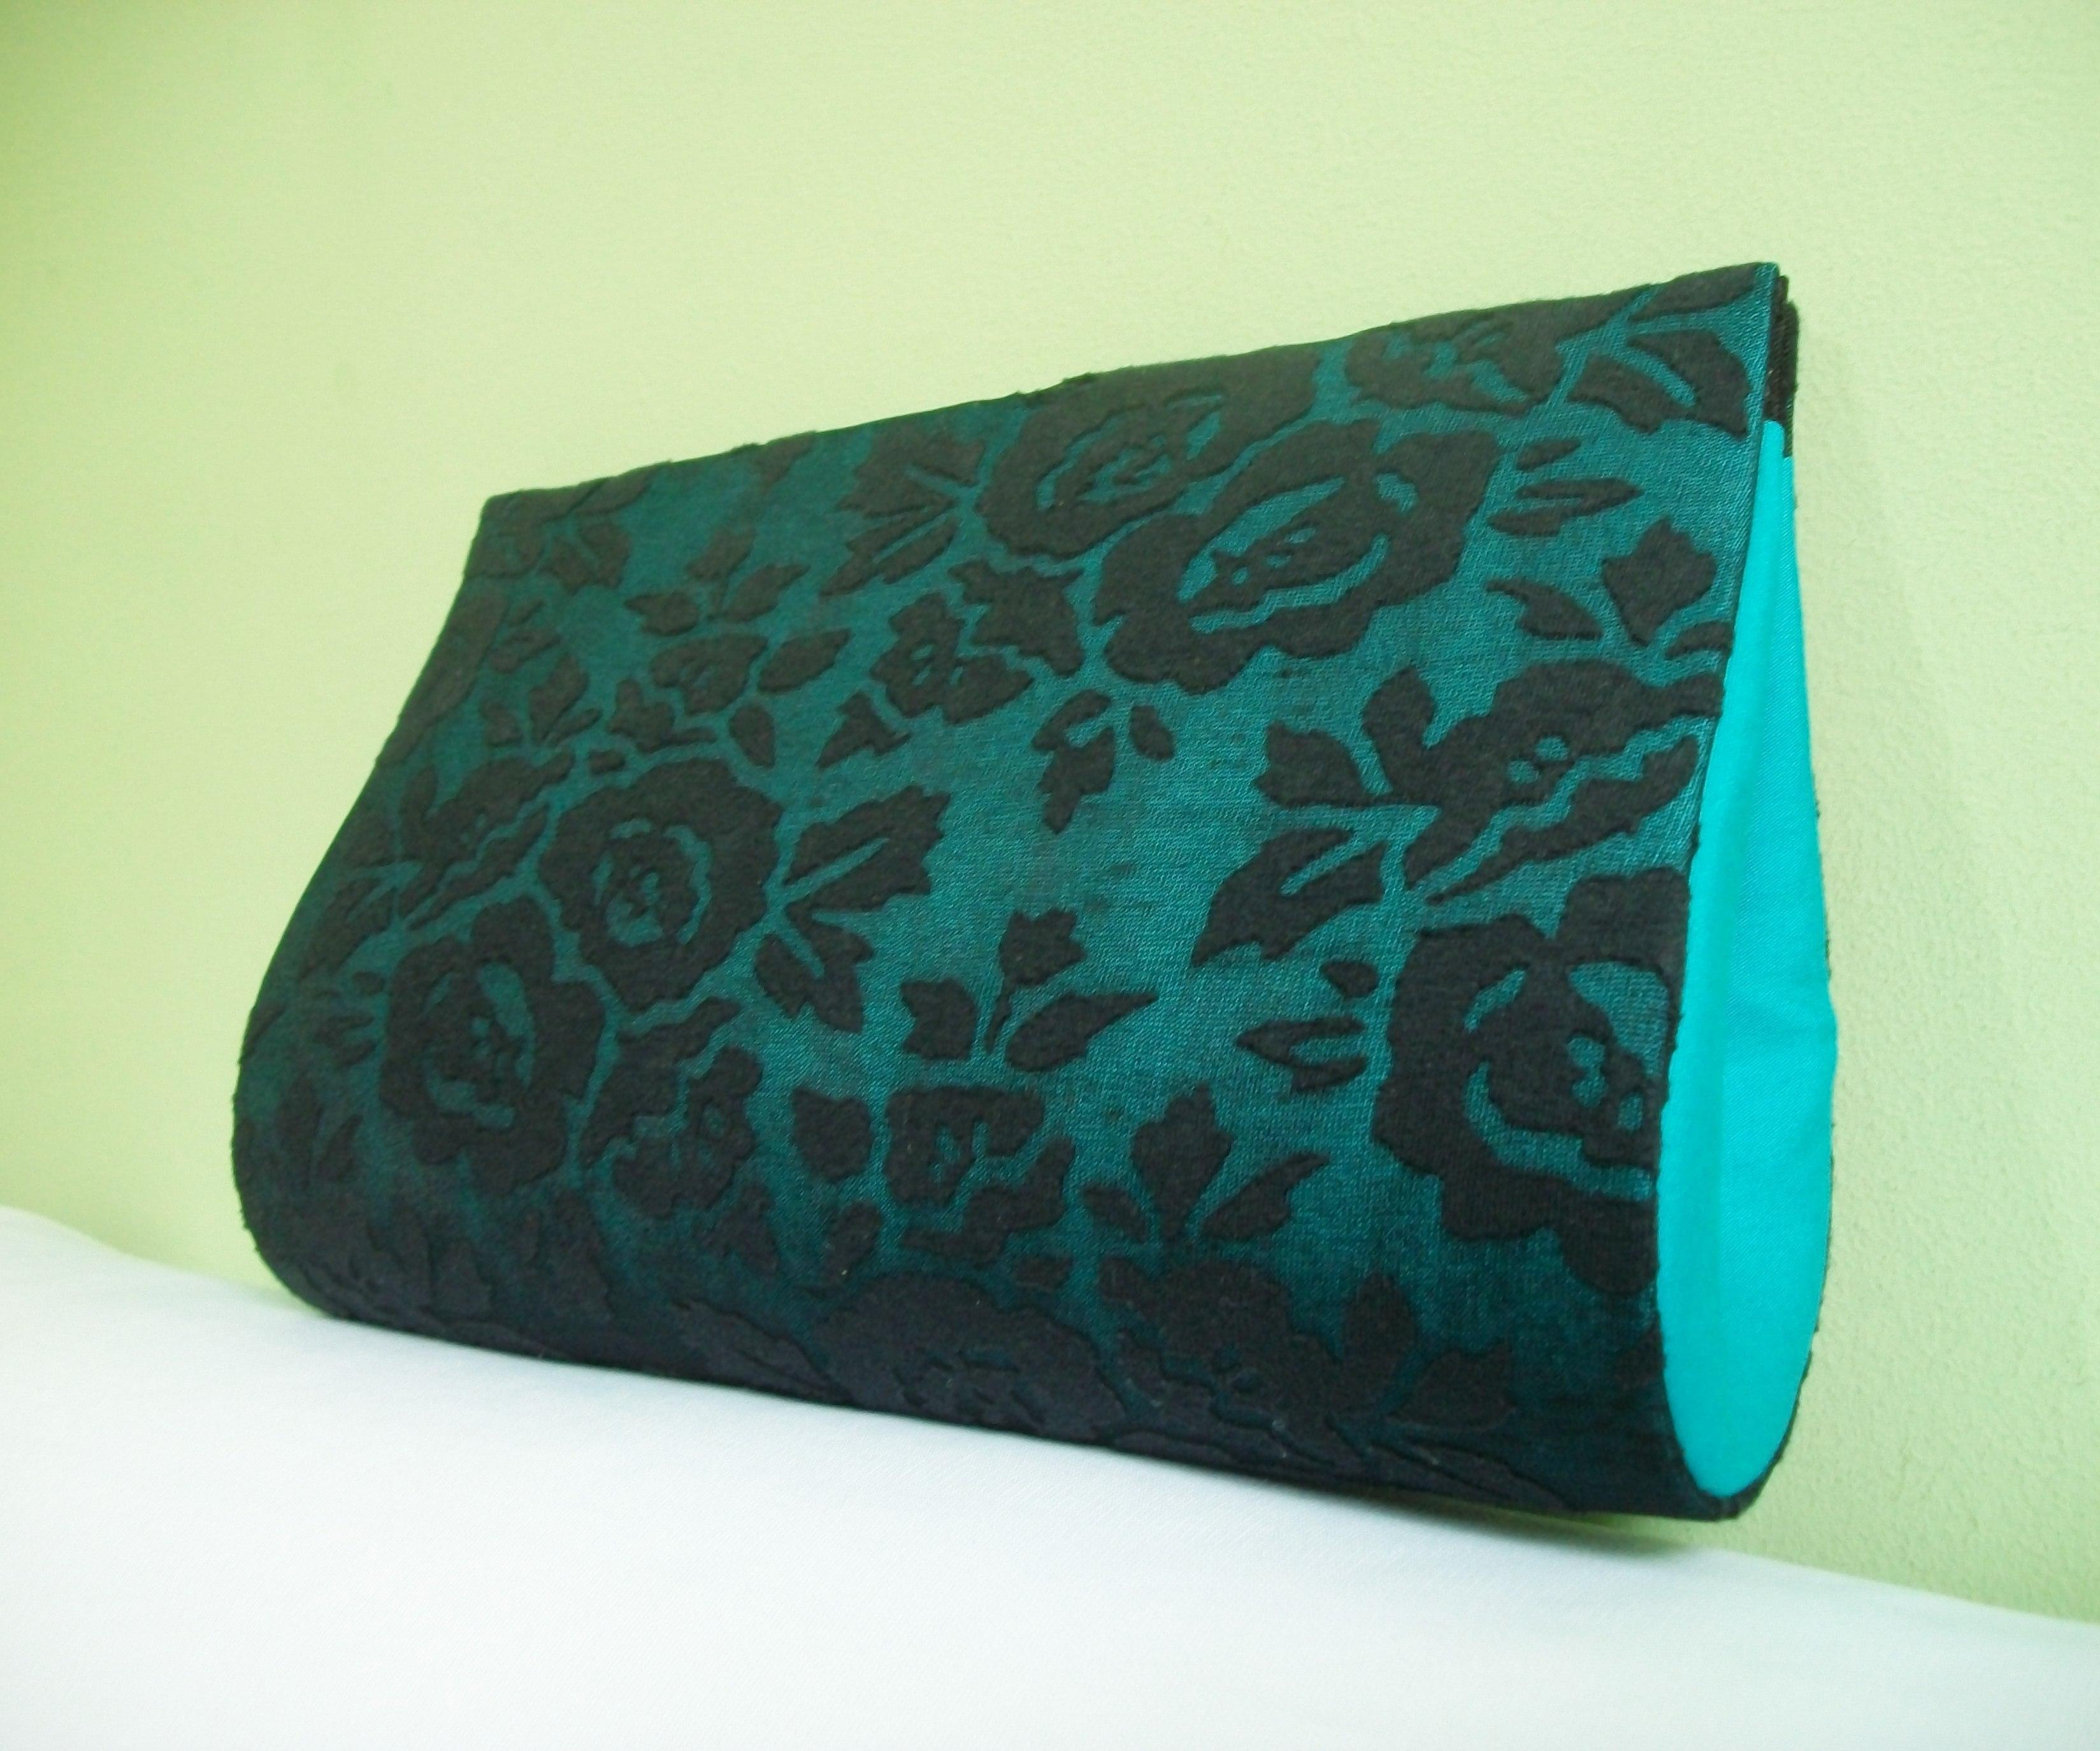 Bolsa De Mao Turquesa : Bolsa clutch azul turquesa c renda preta oficina de arte